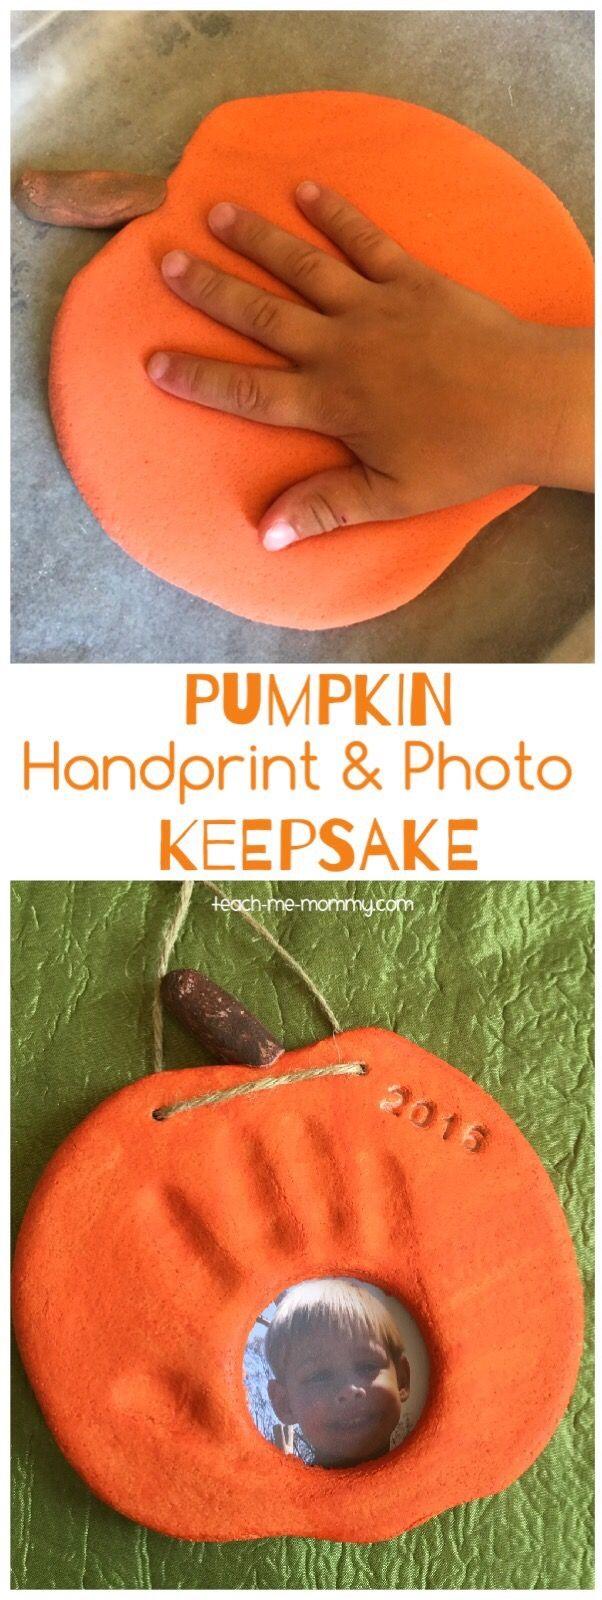 Pumpkin Handprint & Photo Keepsake